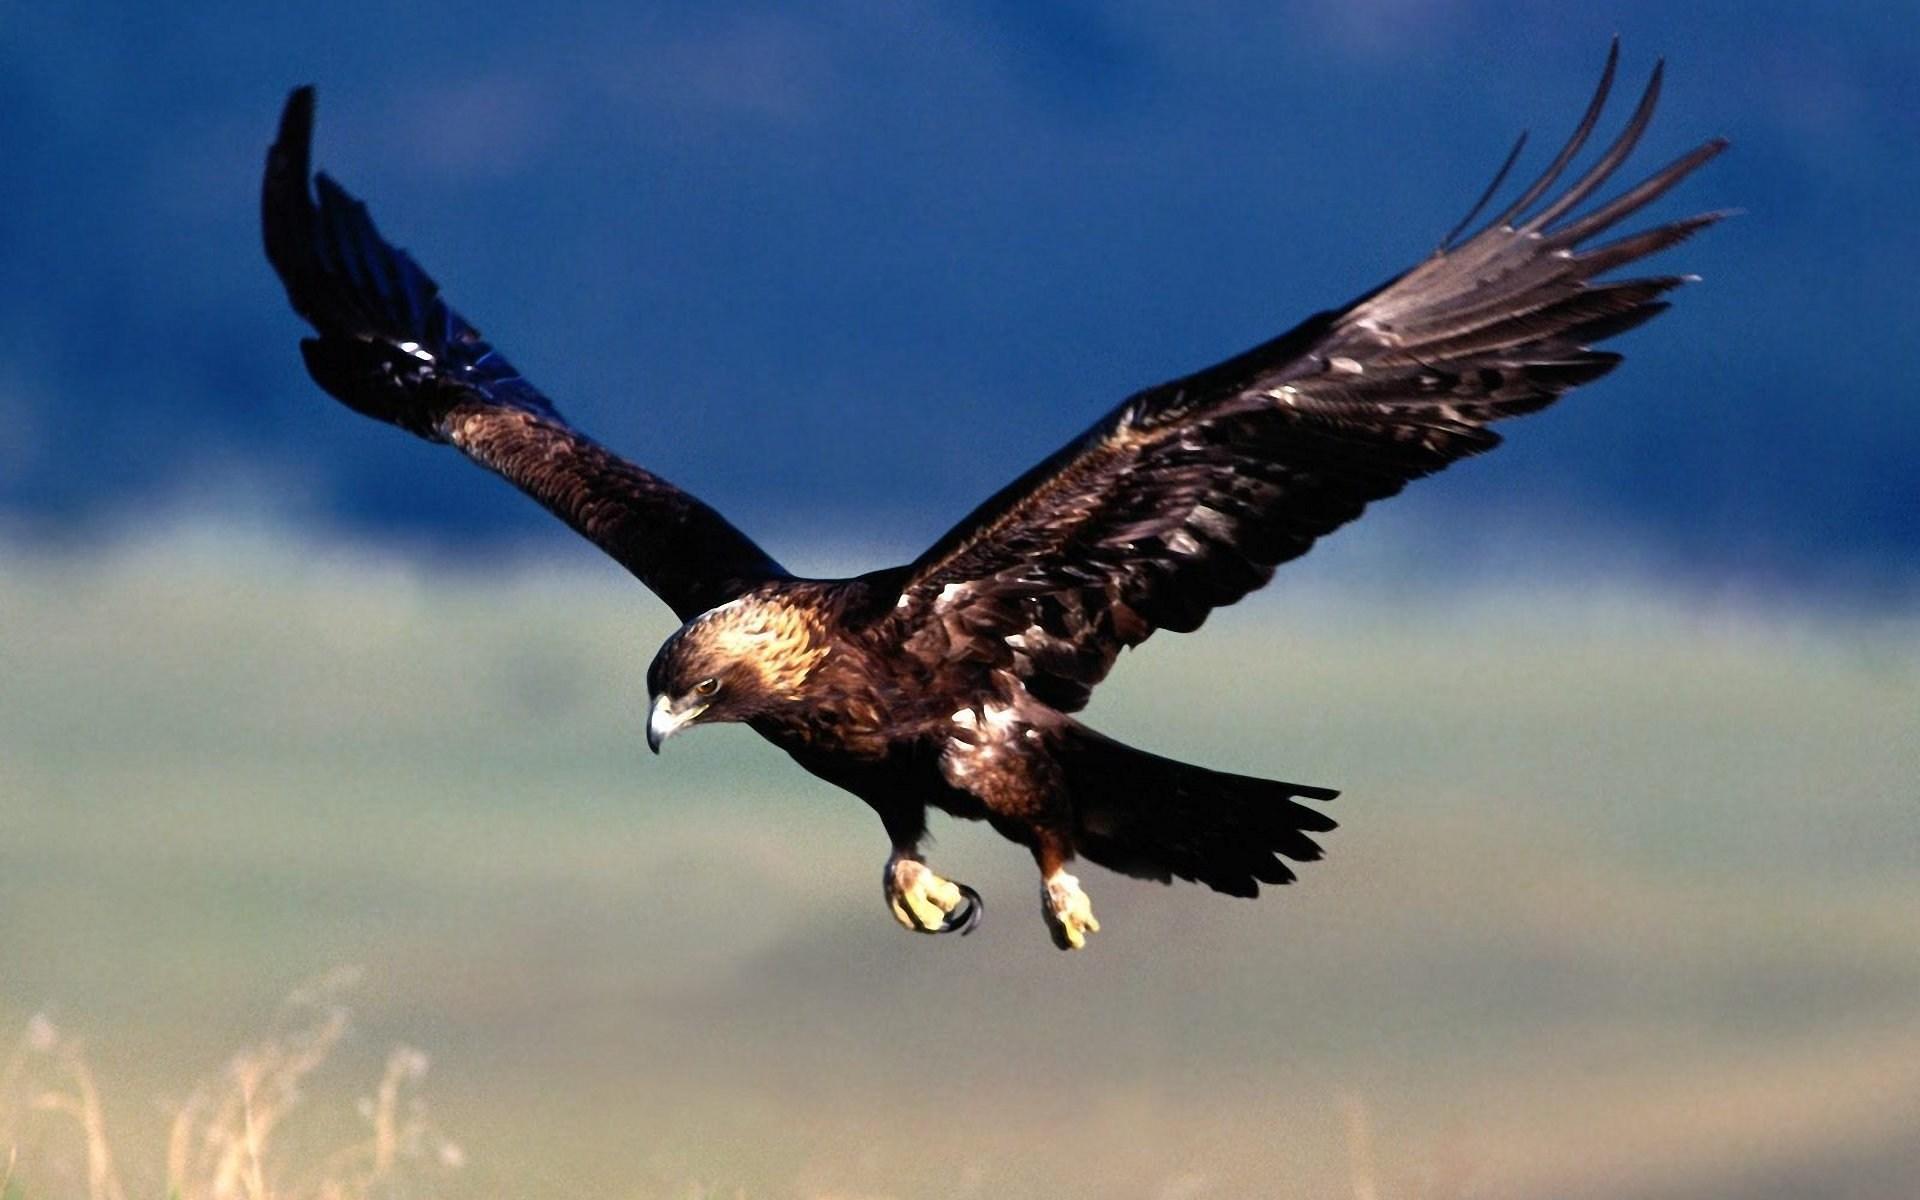 flying hawk wallpaper 1920x1200